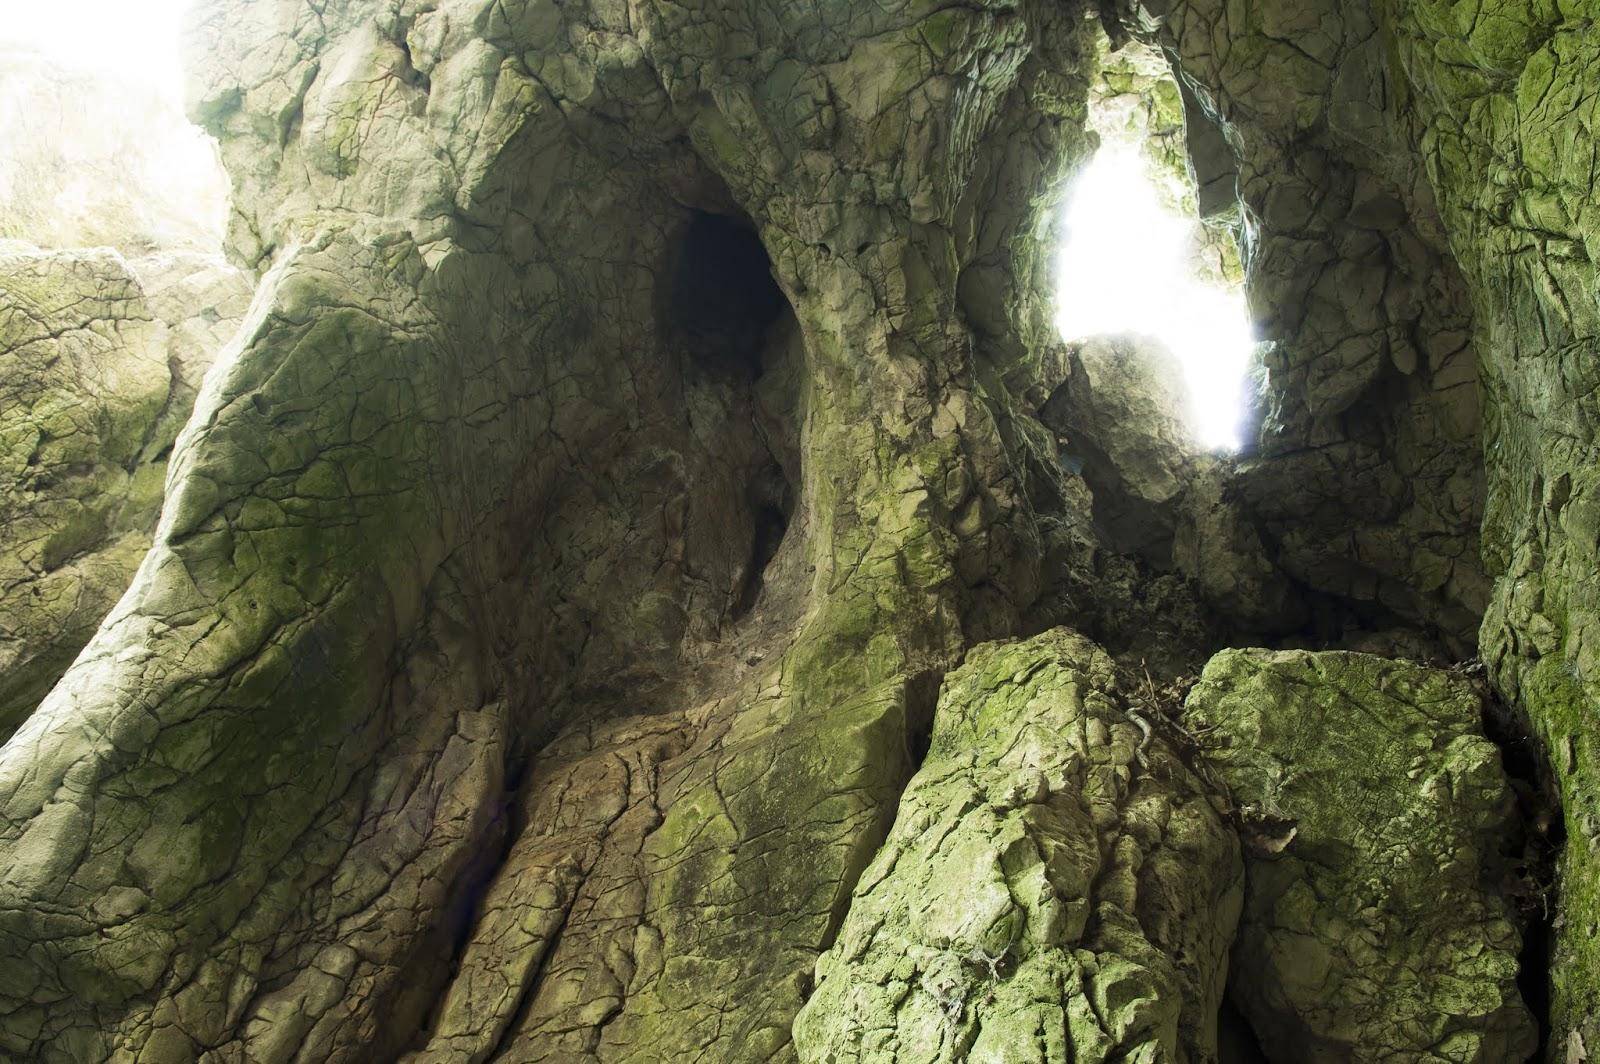 Remete-szurdok barlangjai